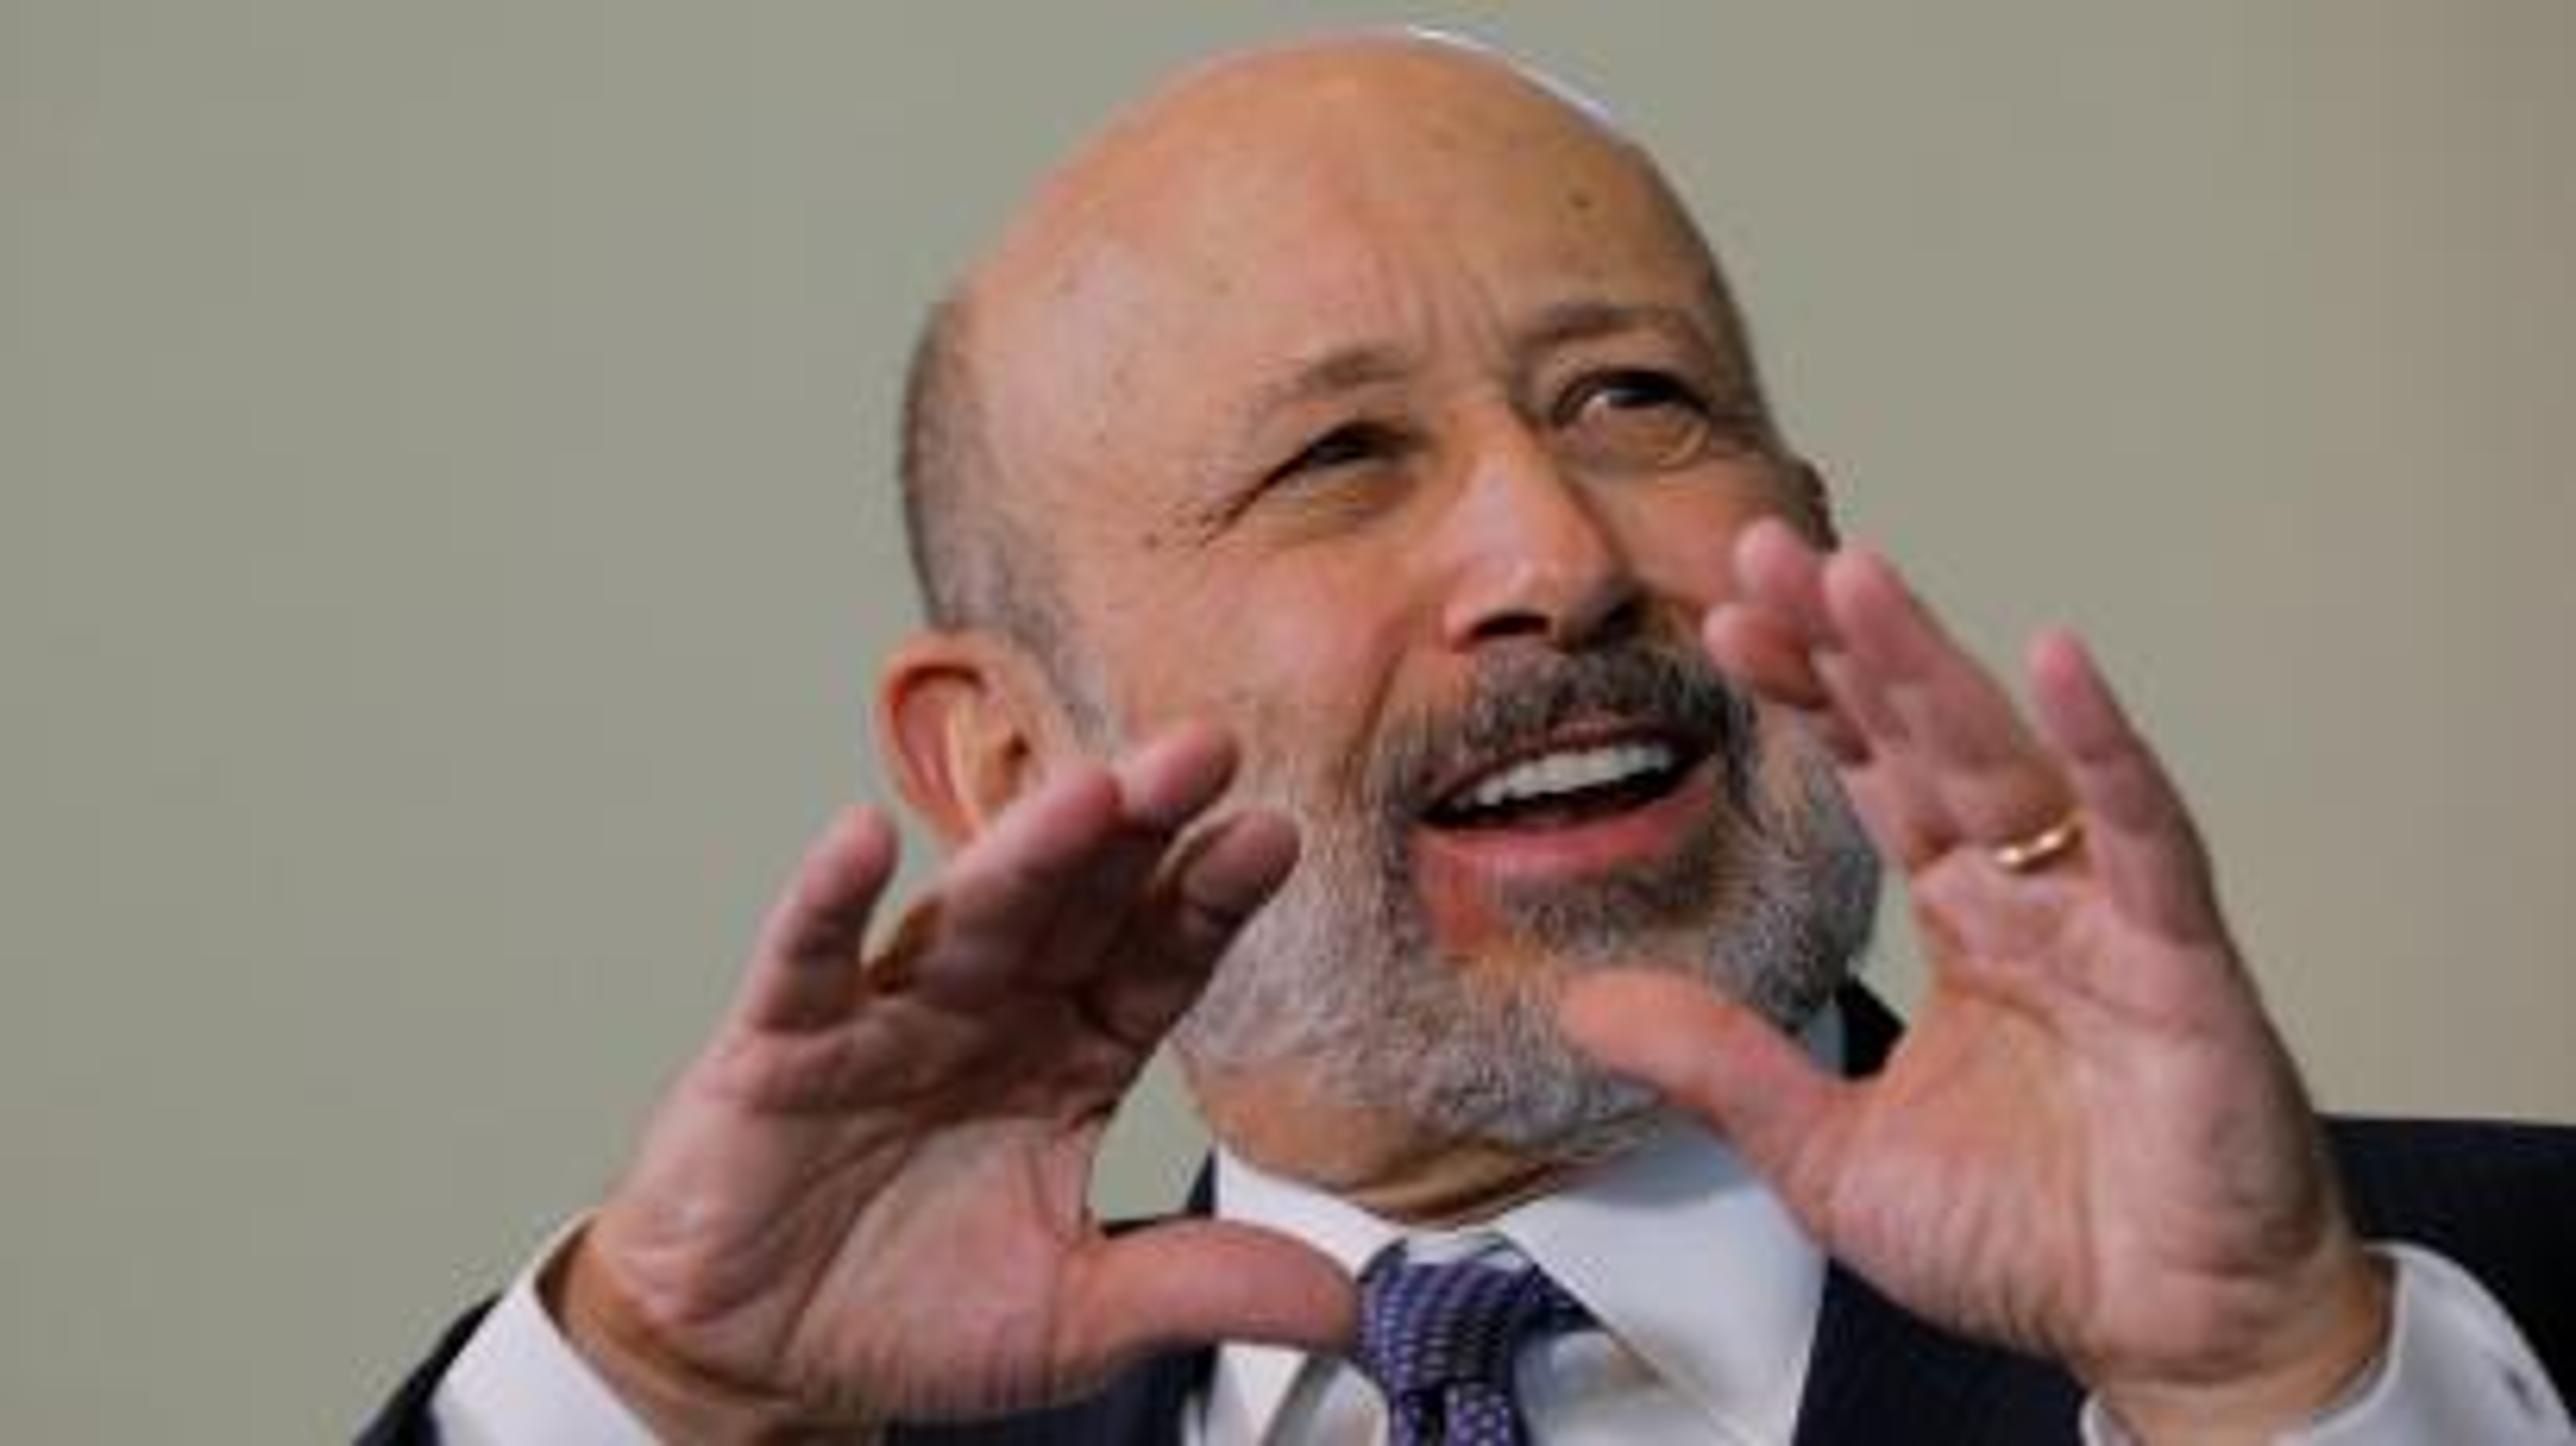 Goldman Sachs Ceo Lloyd Blankfein S Advice To Interns On How Build A Successful Career